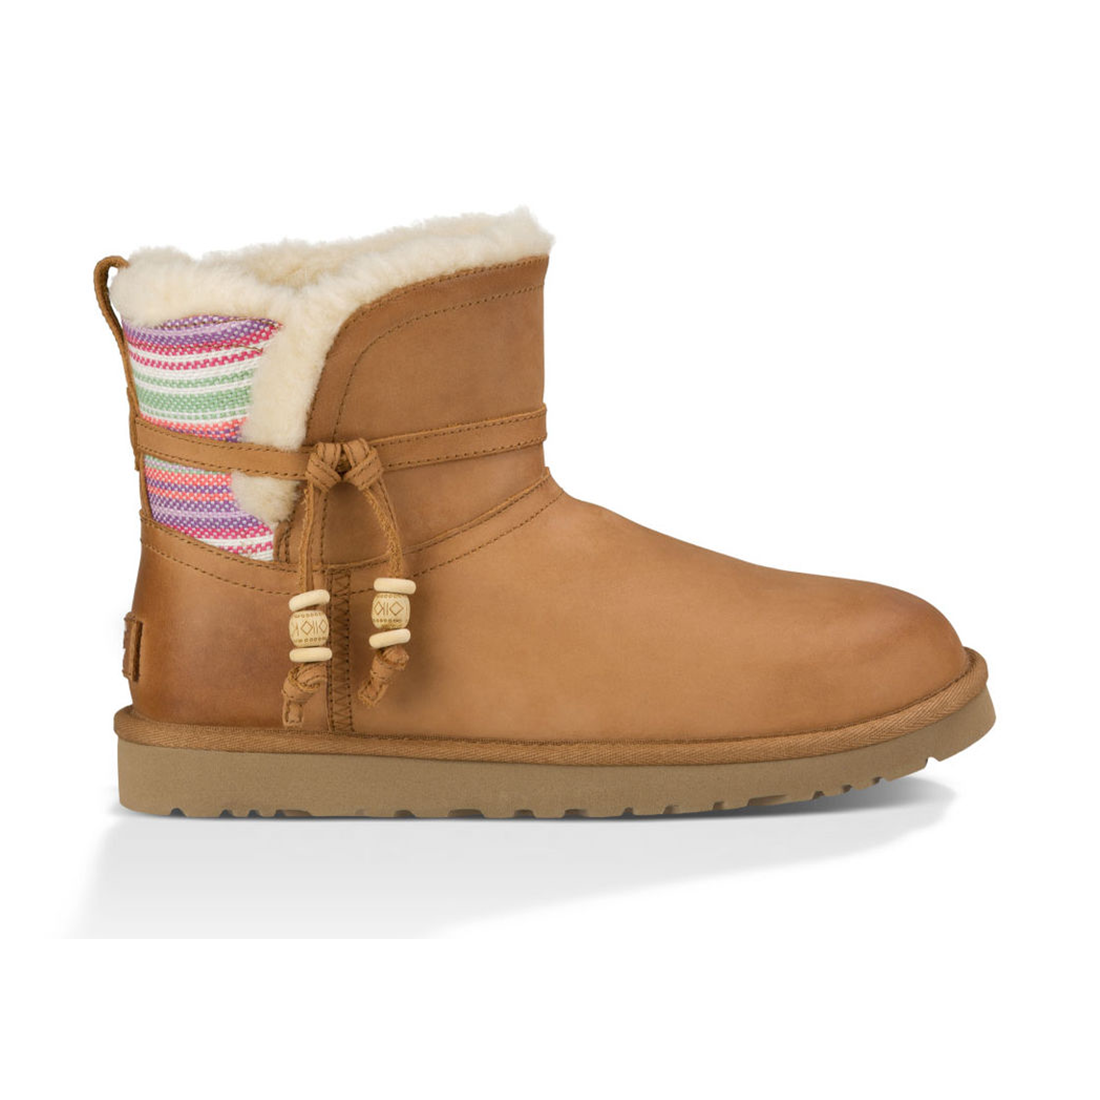 UGG® Women's Auburn Serape Boots from California Republic Clothes